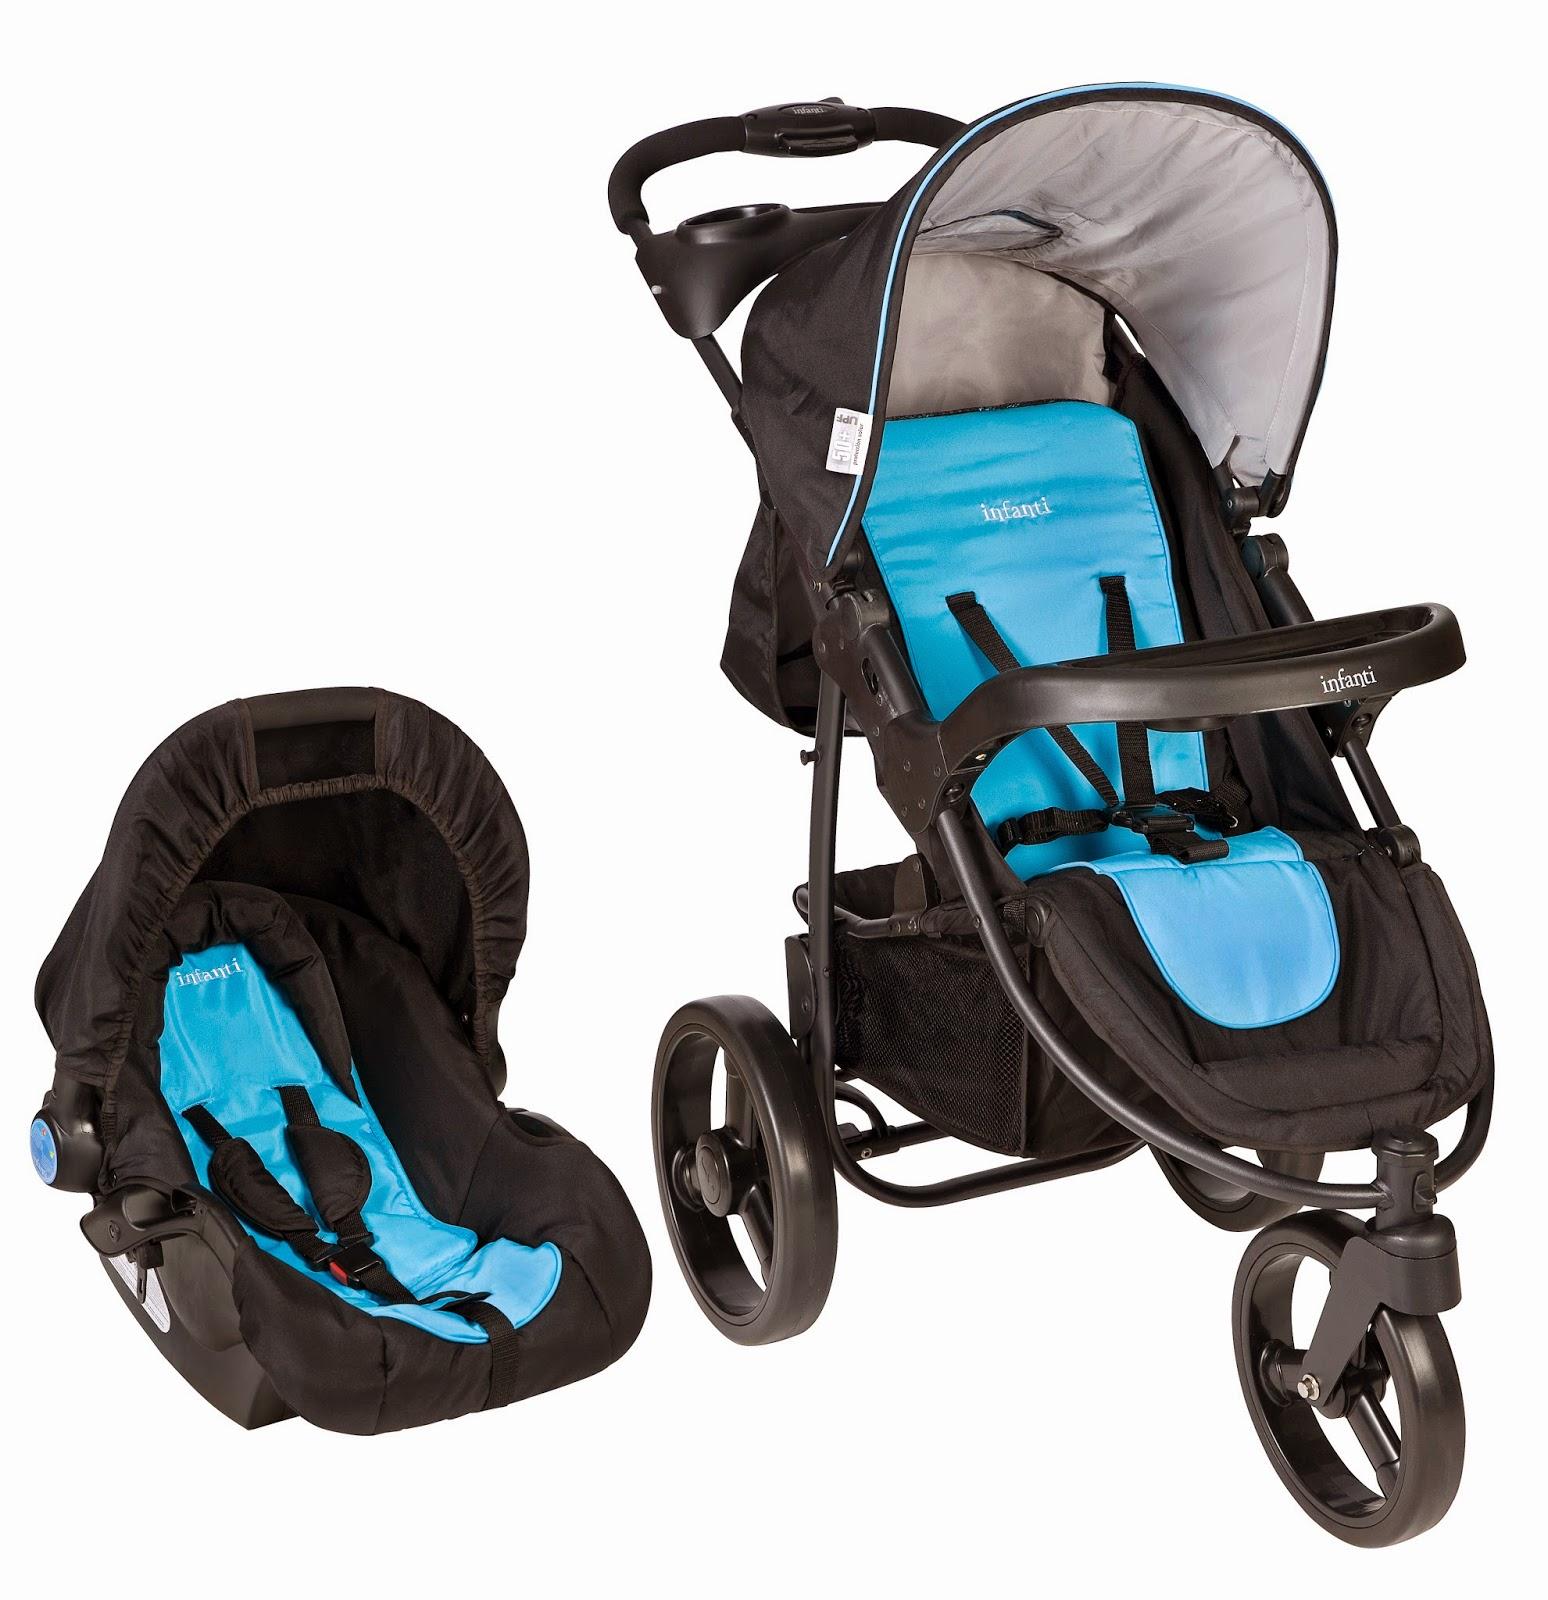 Coche con carguera silla de auto panama baby rentals for Coches para bebes con silla para auto